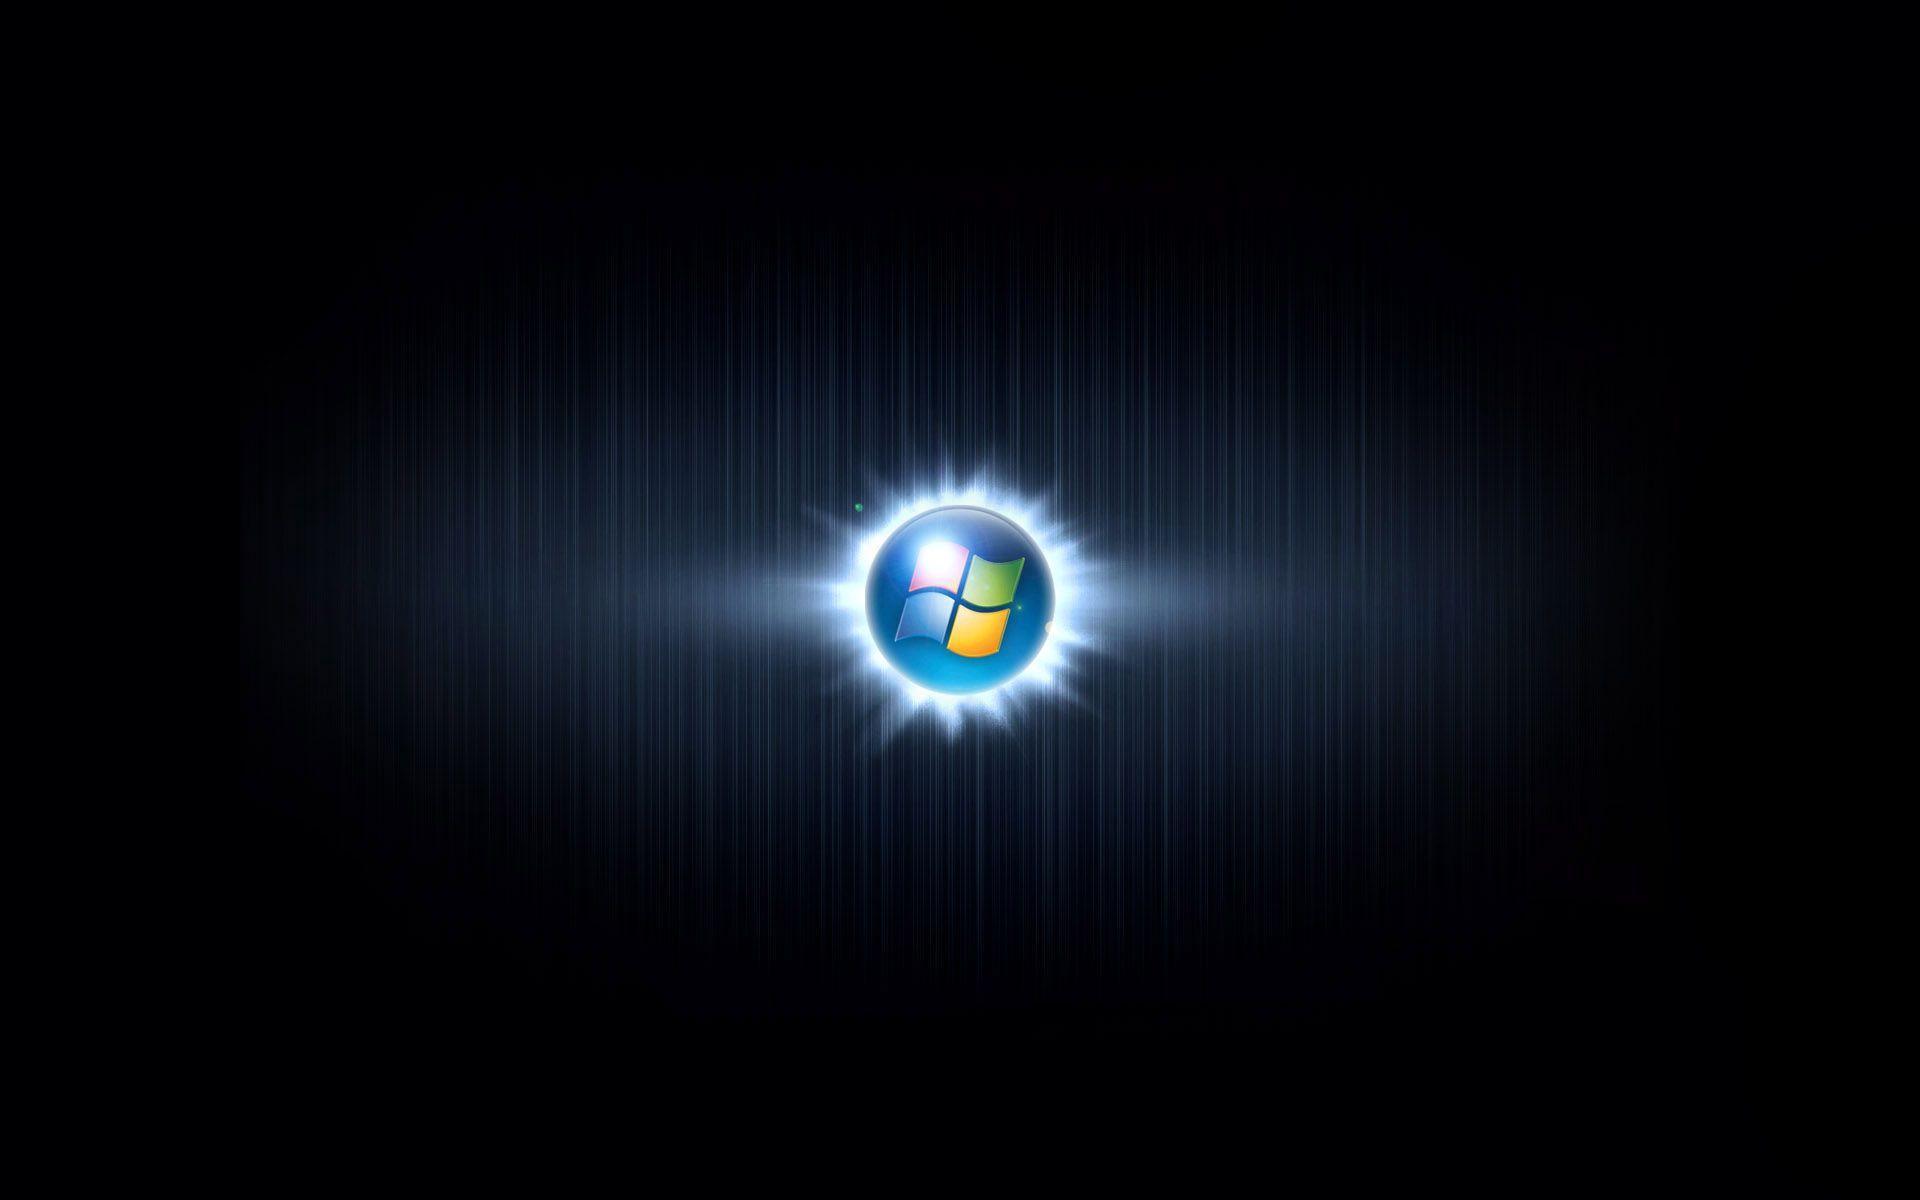 Dell 4K Windows 1 0 Wallpapers - Top Free Dell 4K Windows 1 0